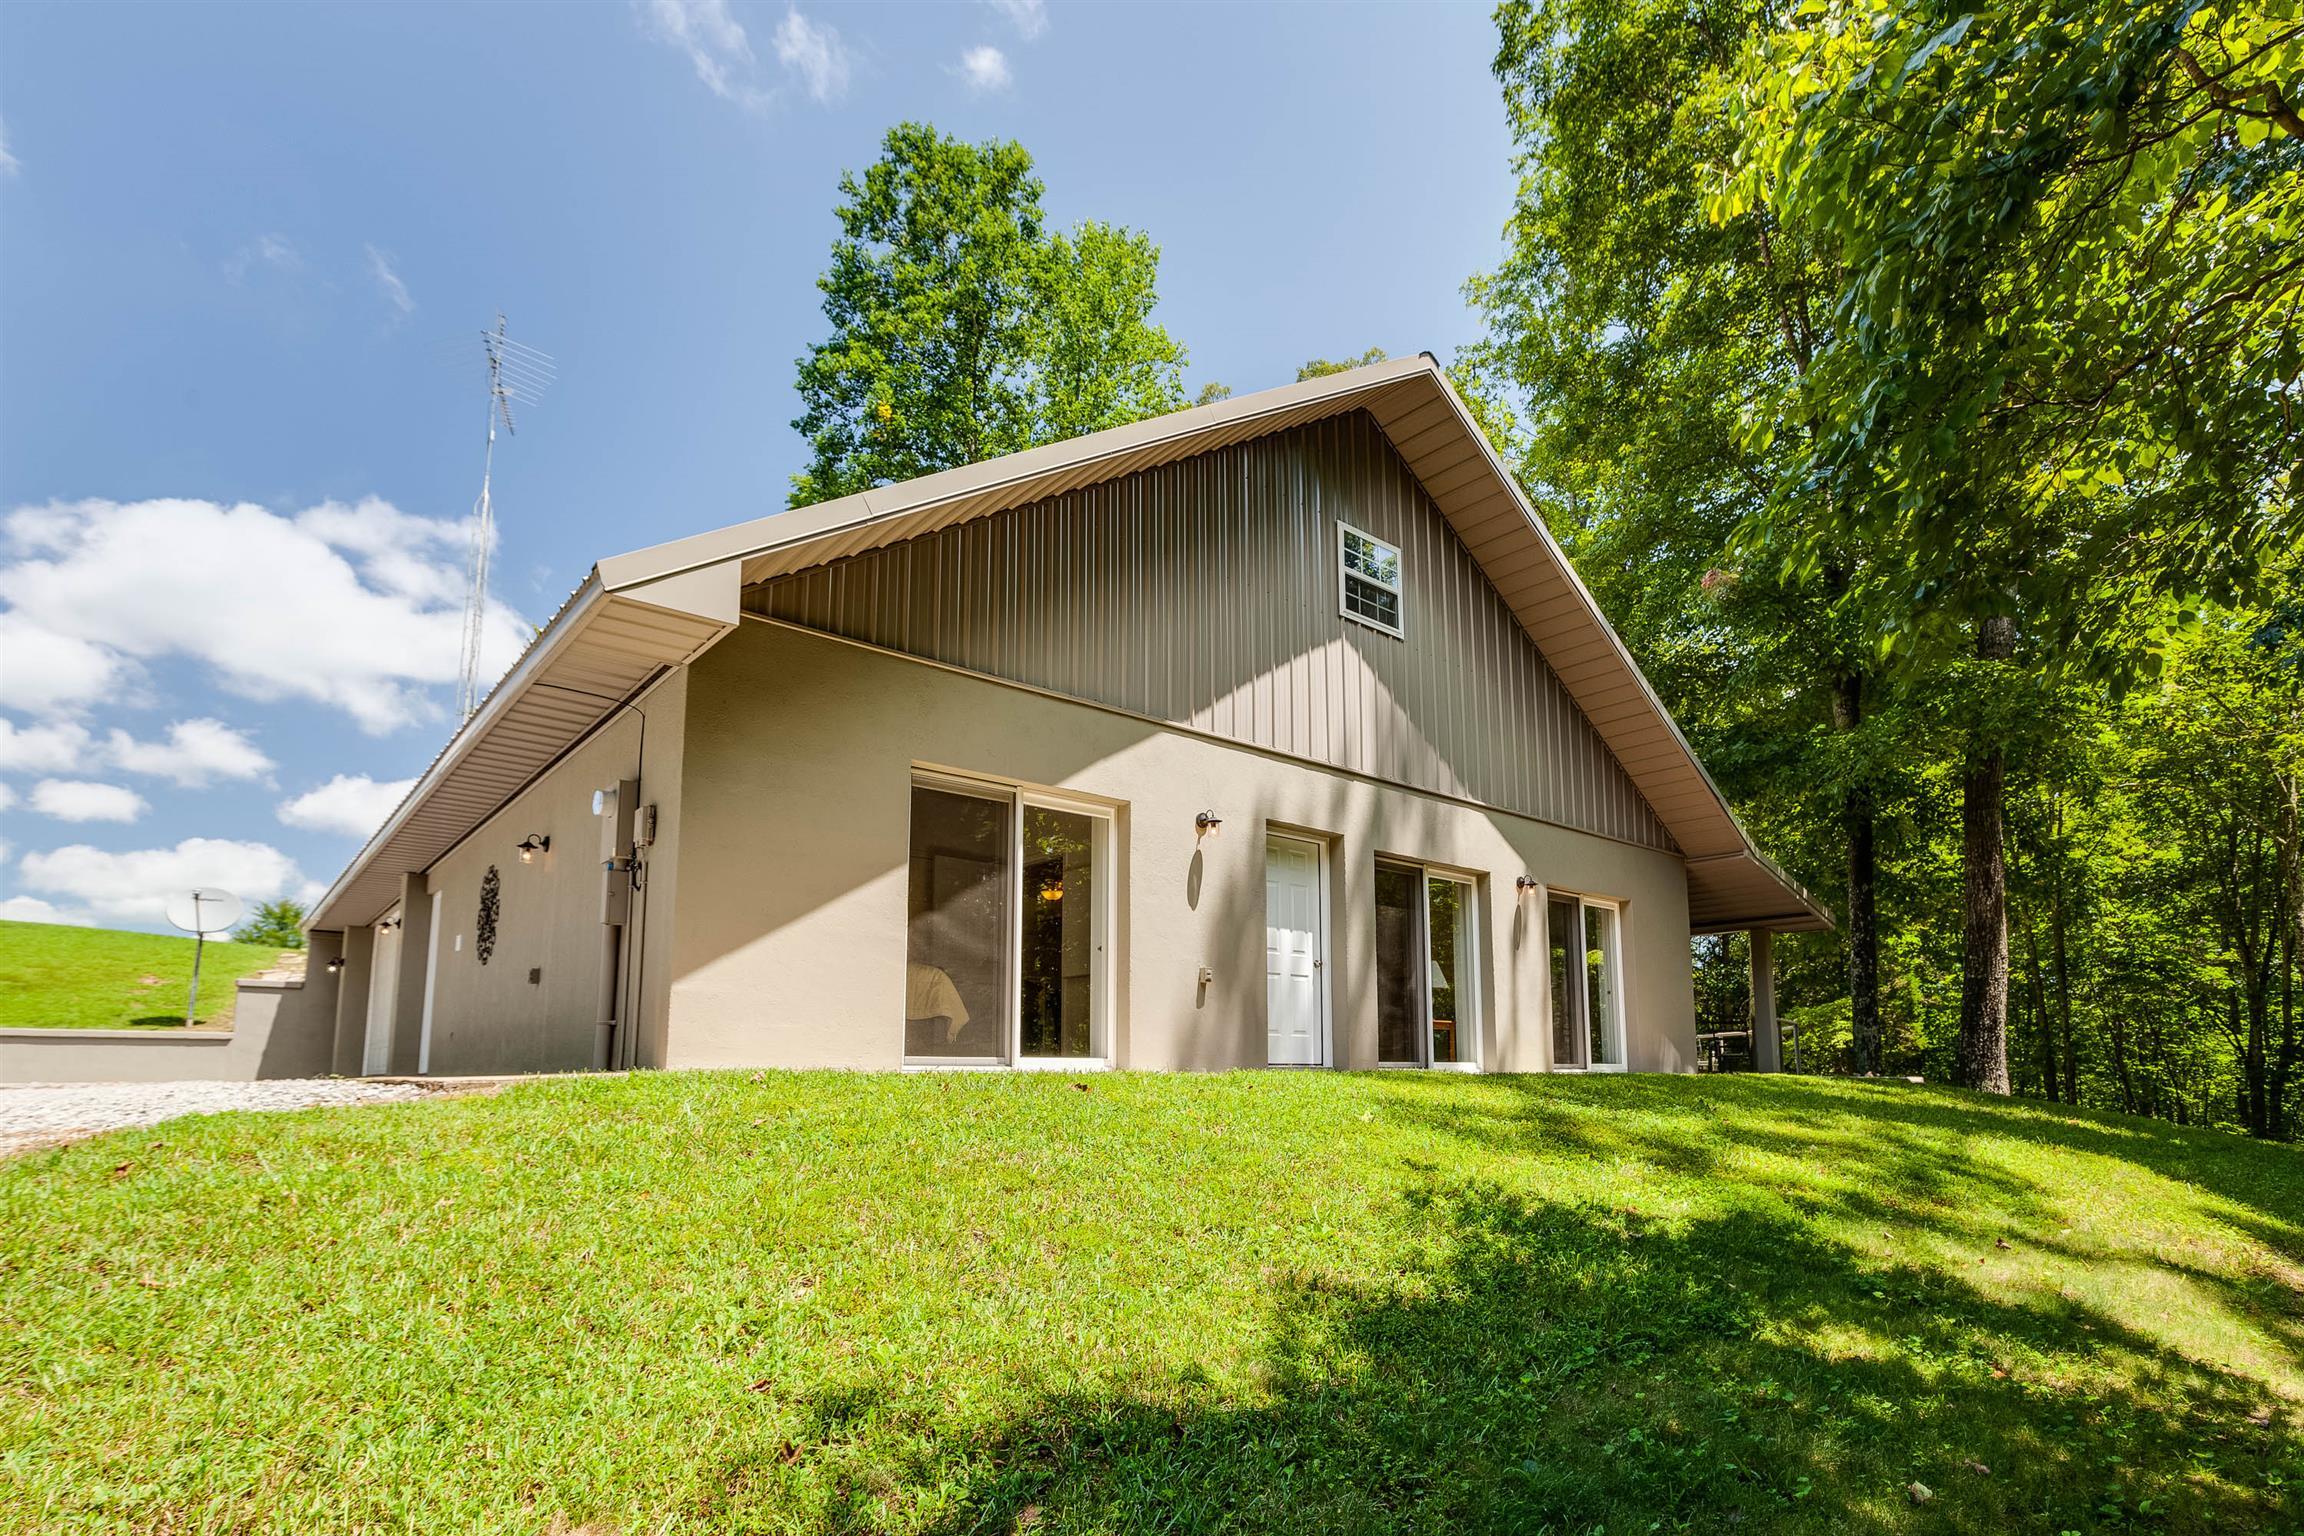 294 Mount Lebanon Rd, Lawrenceburg, TN 38464 - Lawrenceburg, TN real estate listing